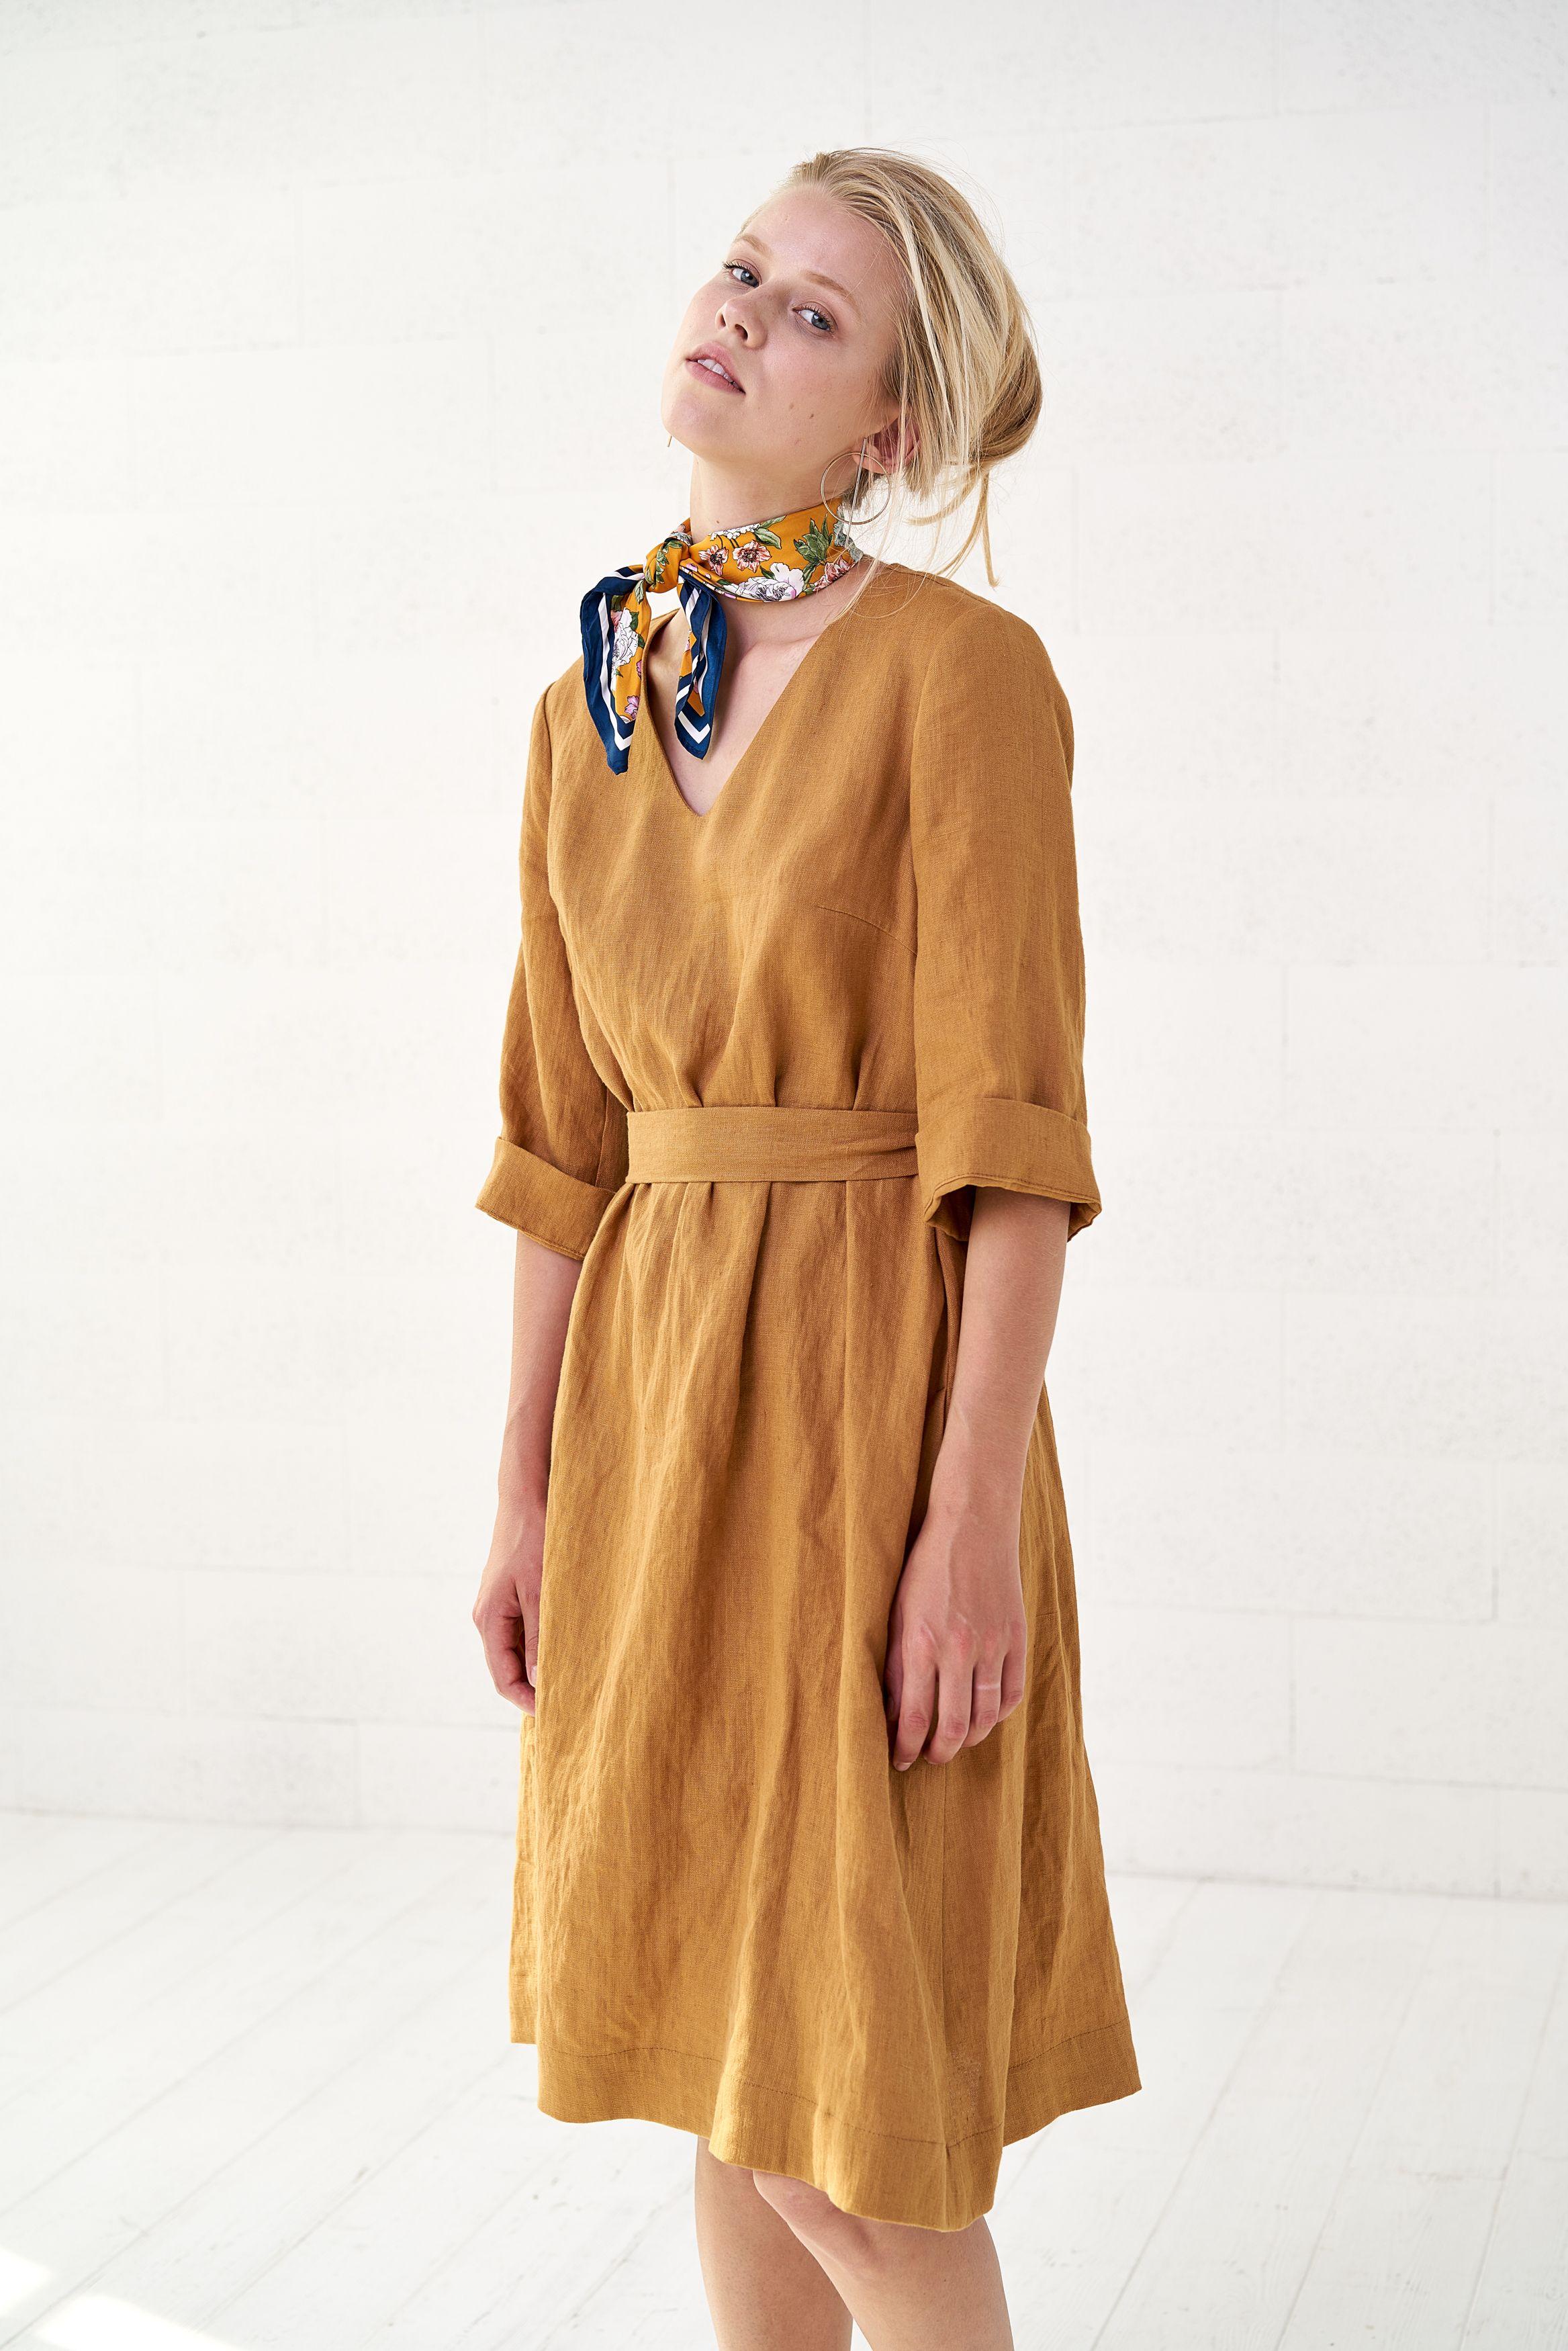 Women S Mustard Linen Wrap Dress Vintage Linen Midi Dress Etsy Vintage Wrap Dress Wrap Dress Linen Clothes [ 3500 x 2335 Pixel ]